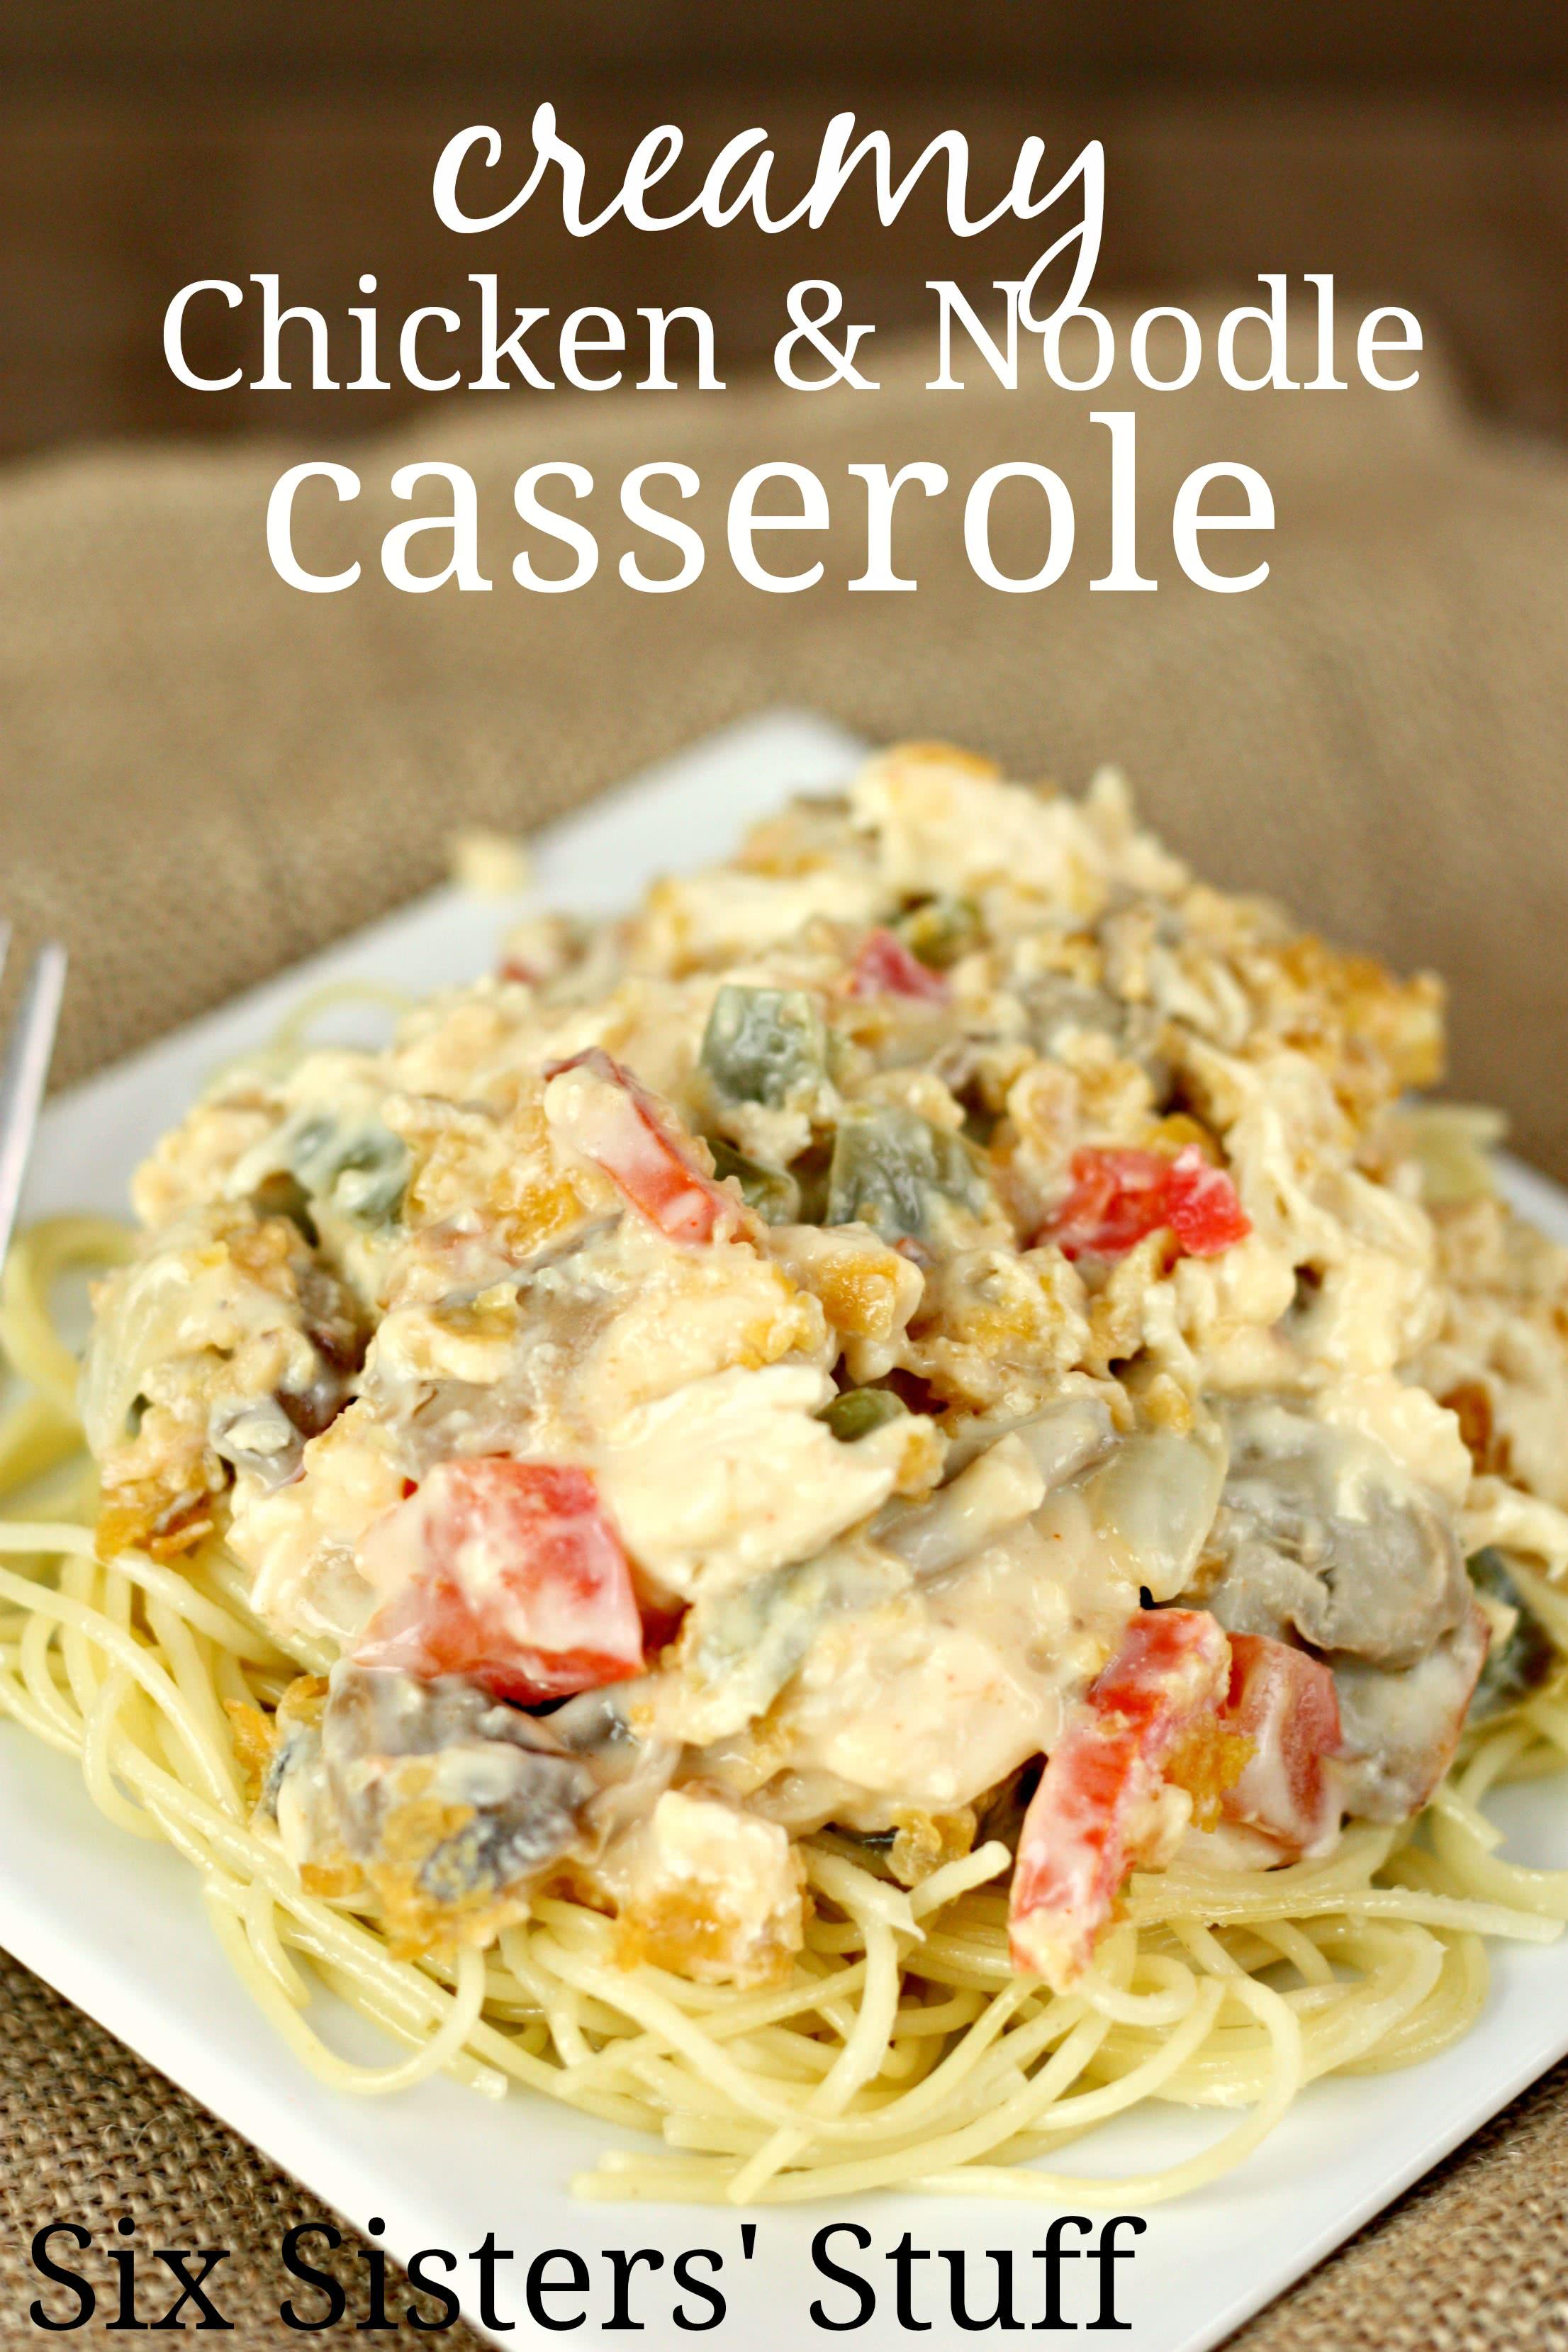 Creamy Chicken and Noodle Casserole